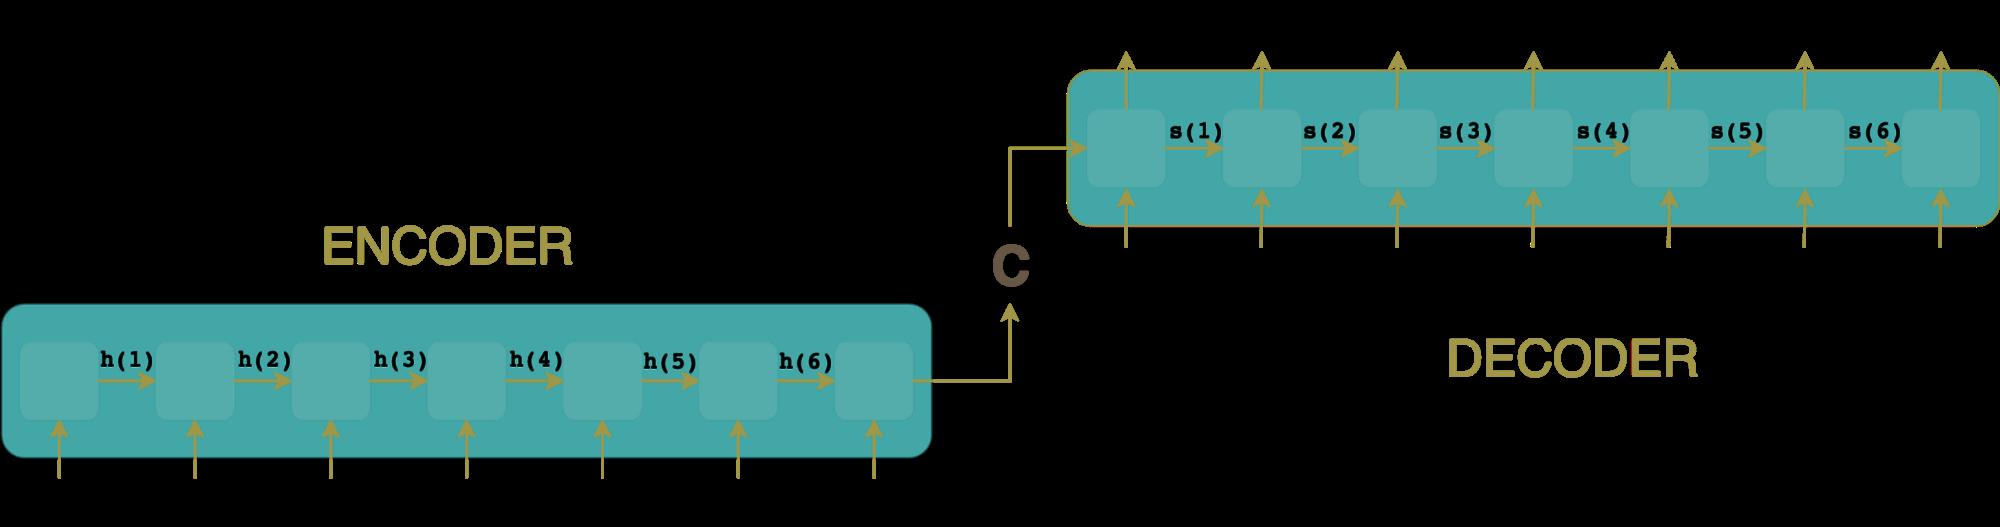 a visual representation of machine translation encoder-decoder architecture